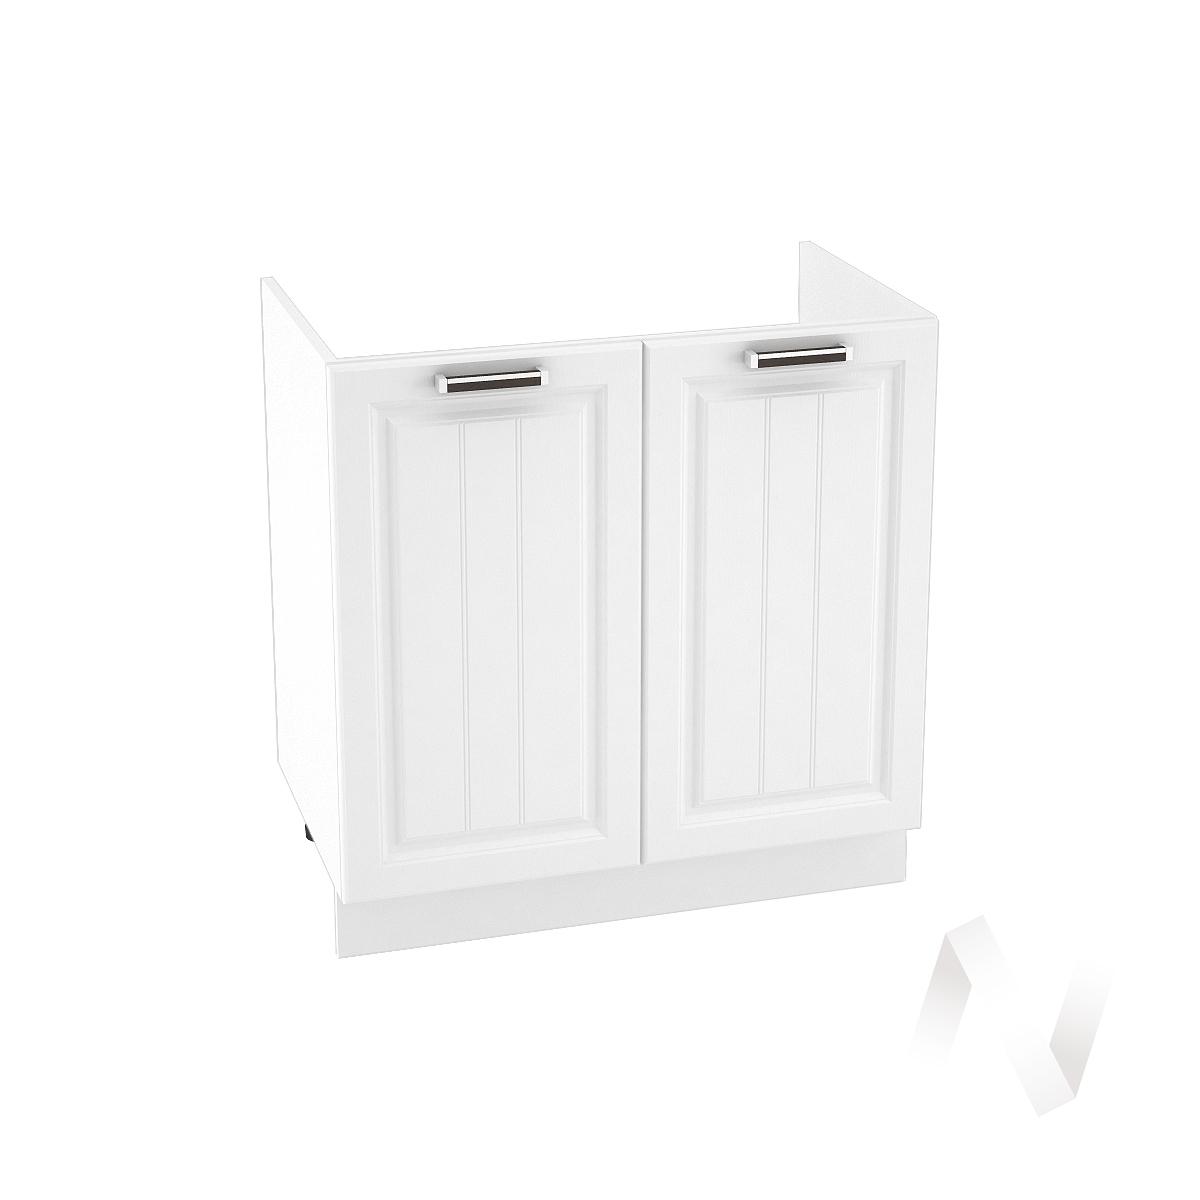 "Кухня ""Прага"": Шкаф нижний под мойку 800, ШНМ 800 (белое дерево/корпус белый)"